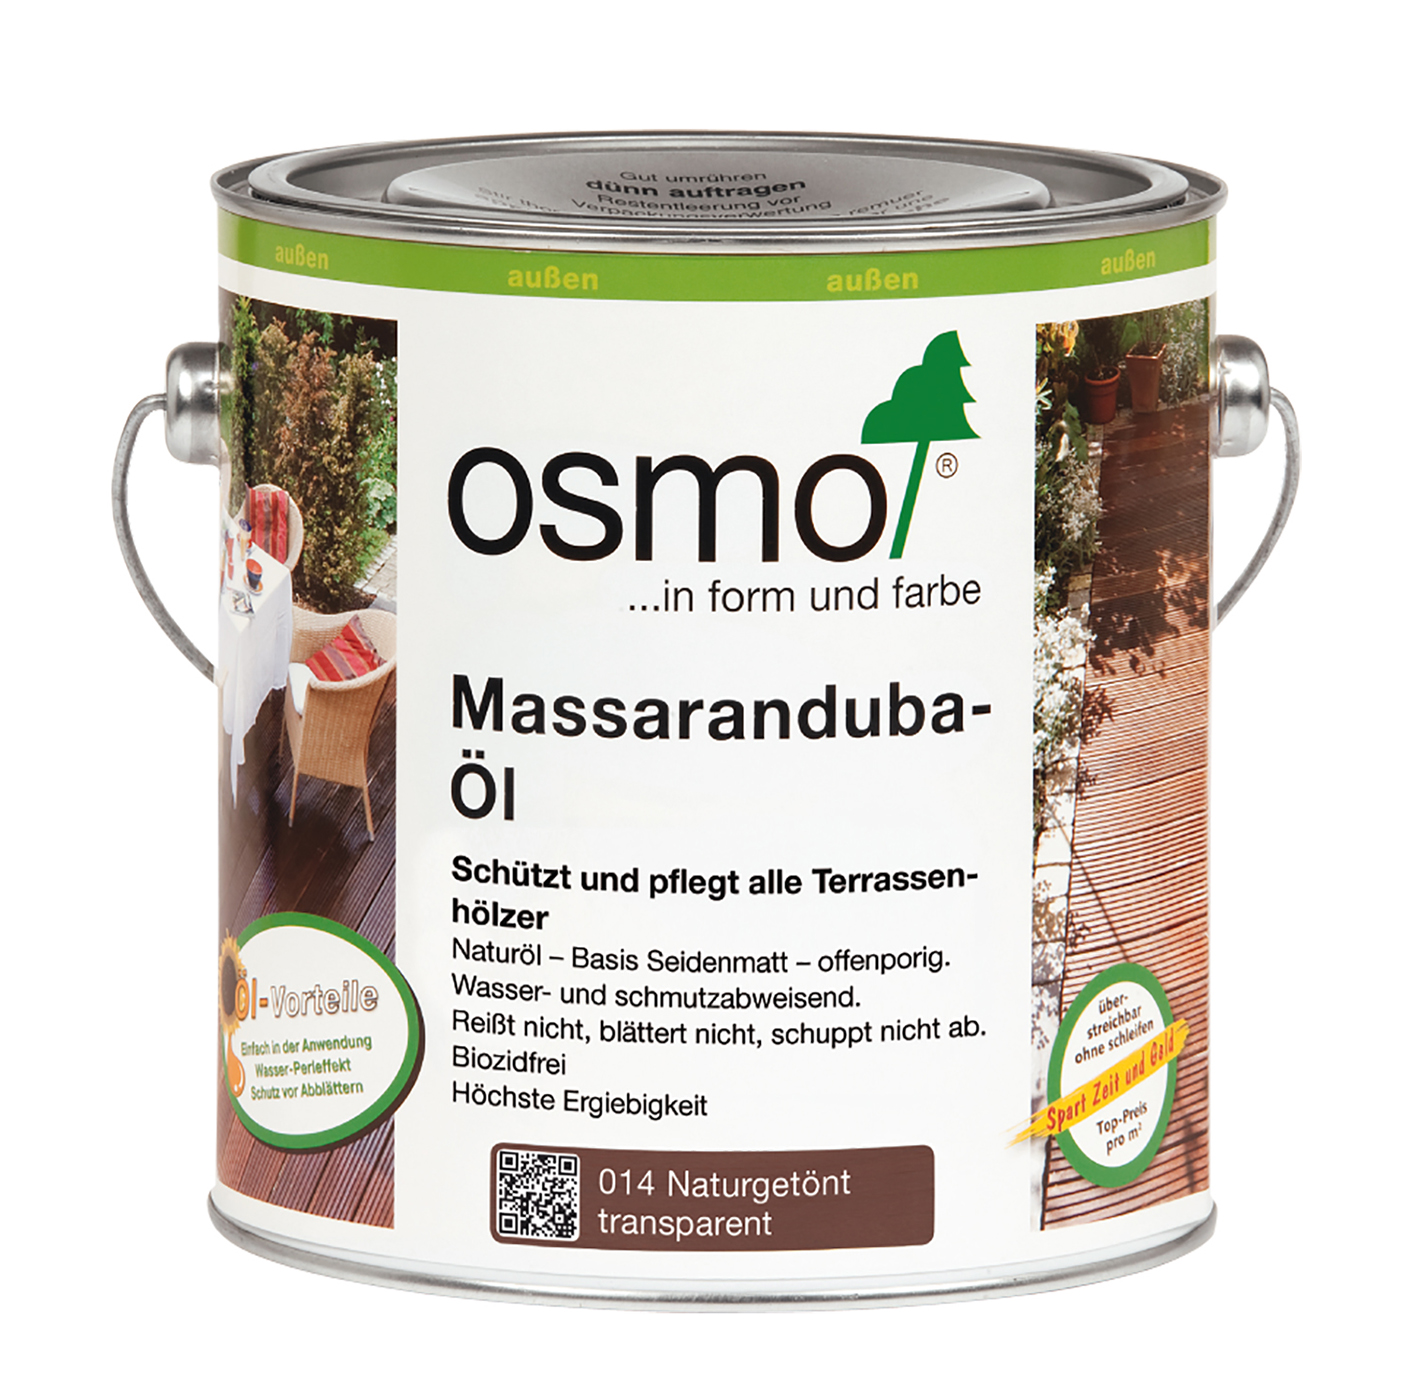 Osmo Massaranduba oil 2,5 Ltr.